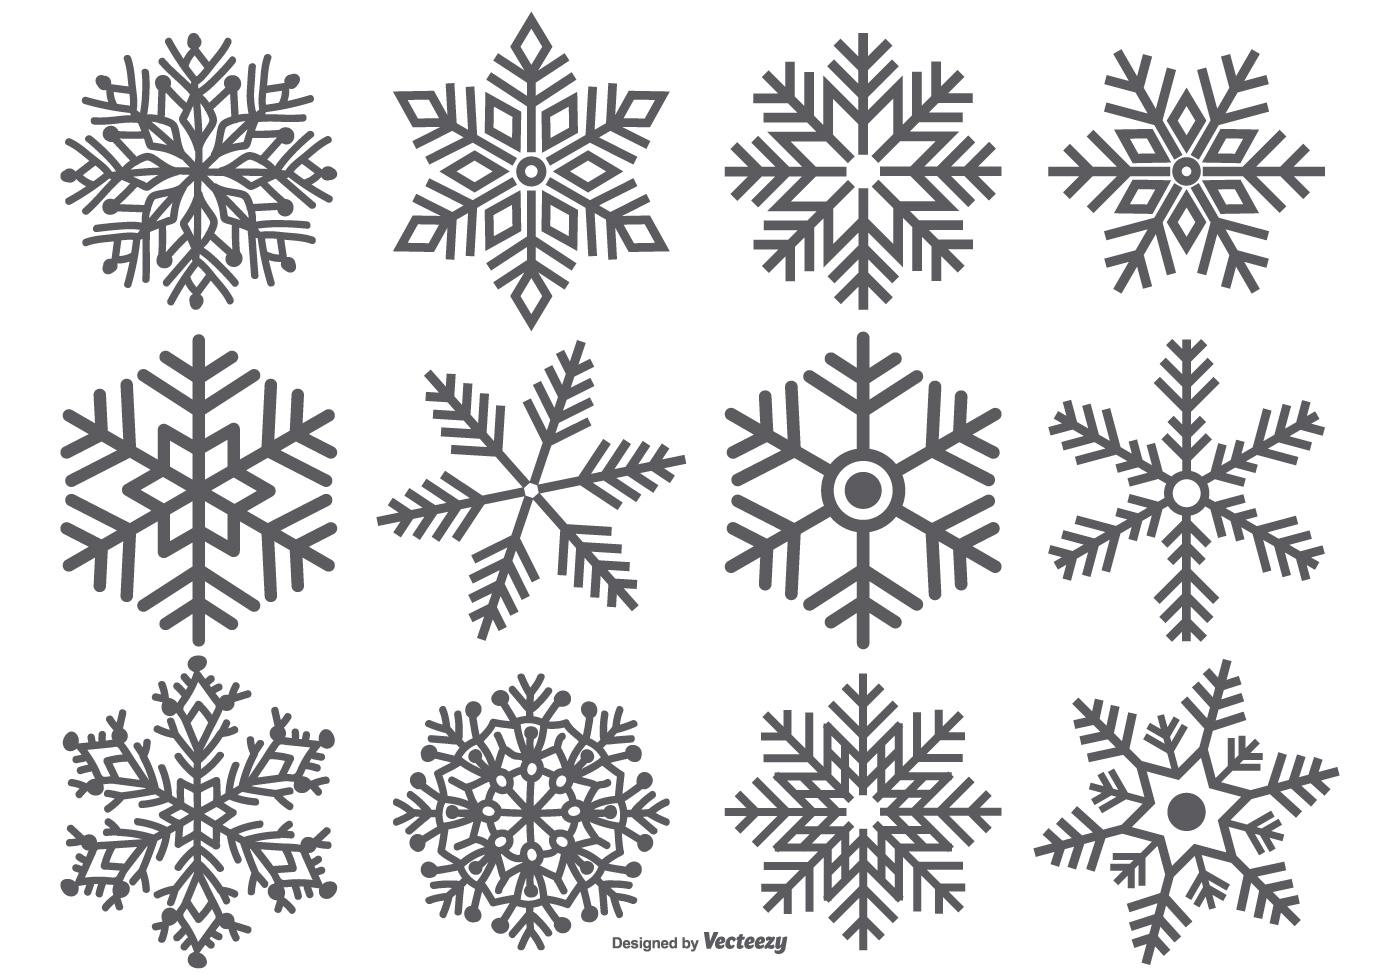 Snowflake Free Vector Art - (7056 Free Downloads)